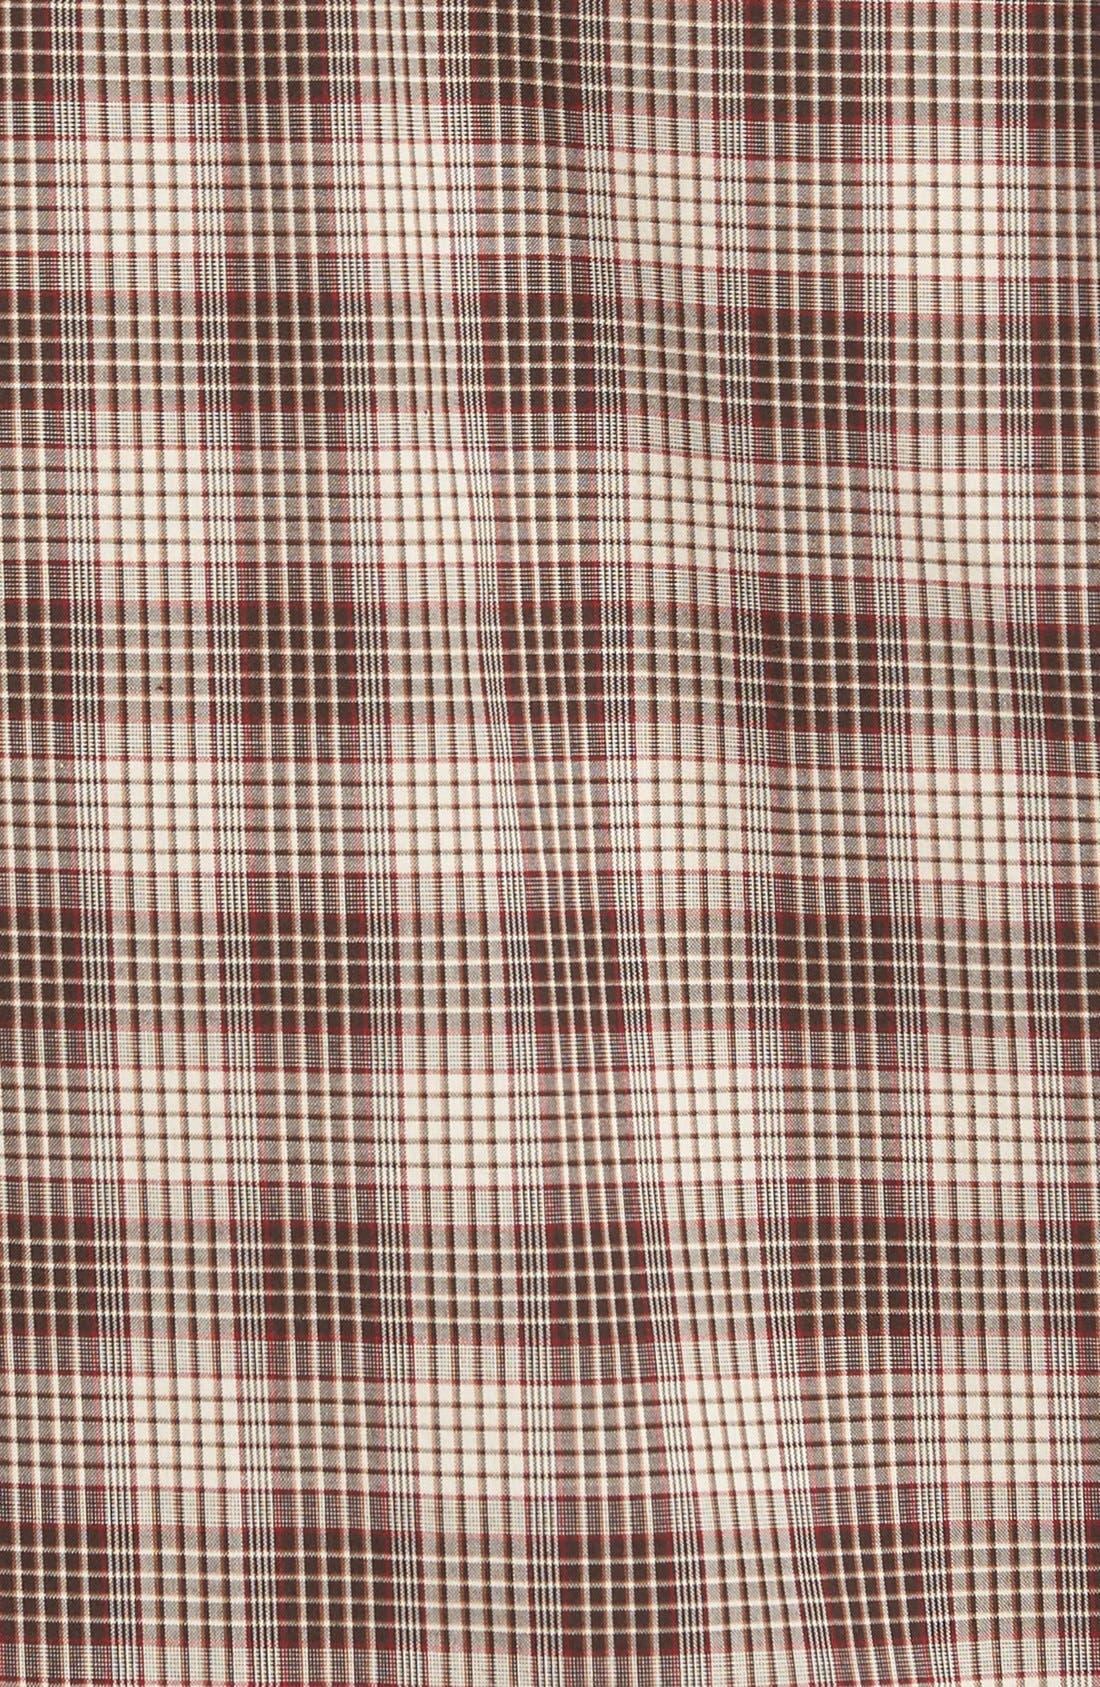 Alternate Image 5  - Cutter & Buck 'Ridge' Plaid Cotton Poplin Sport Shirt (Big & Tall)